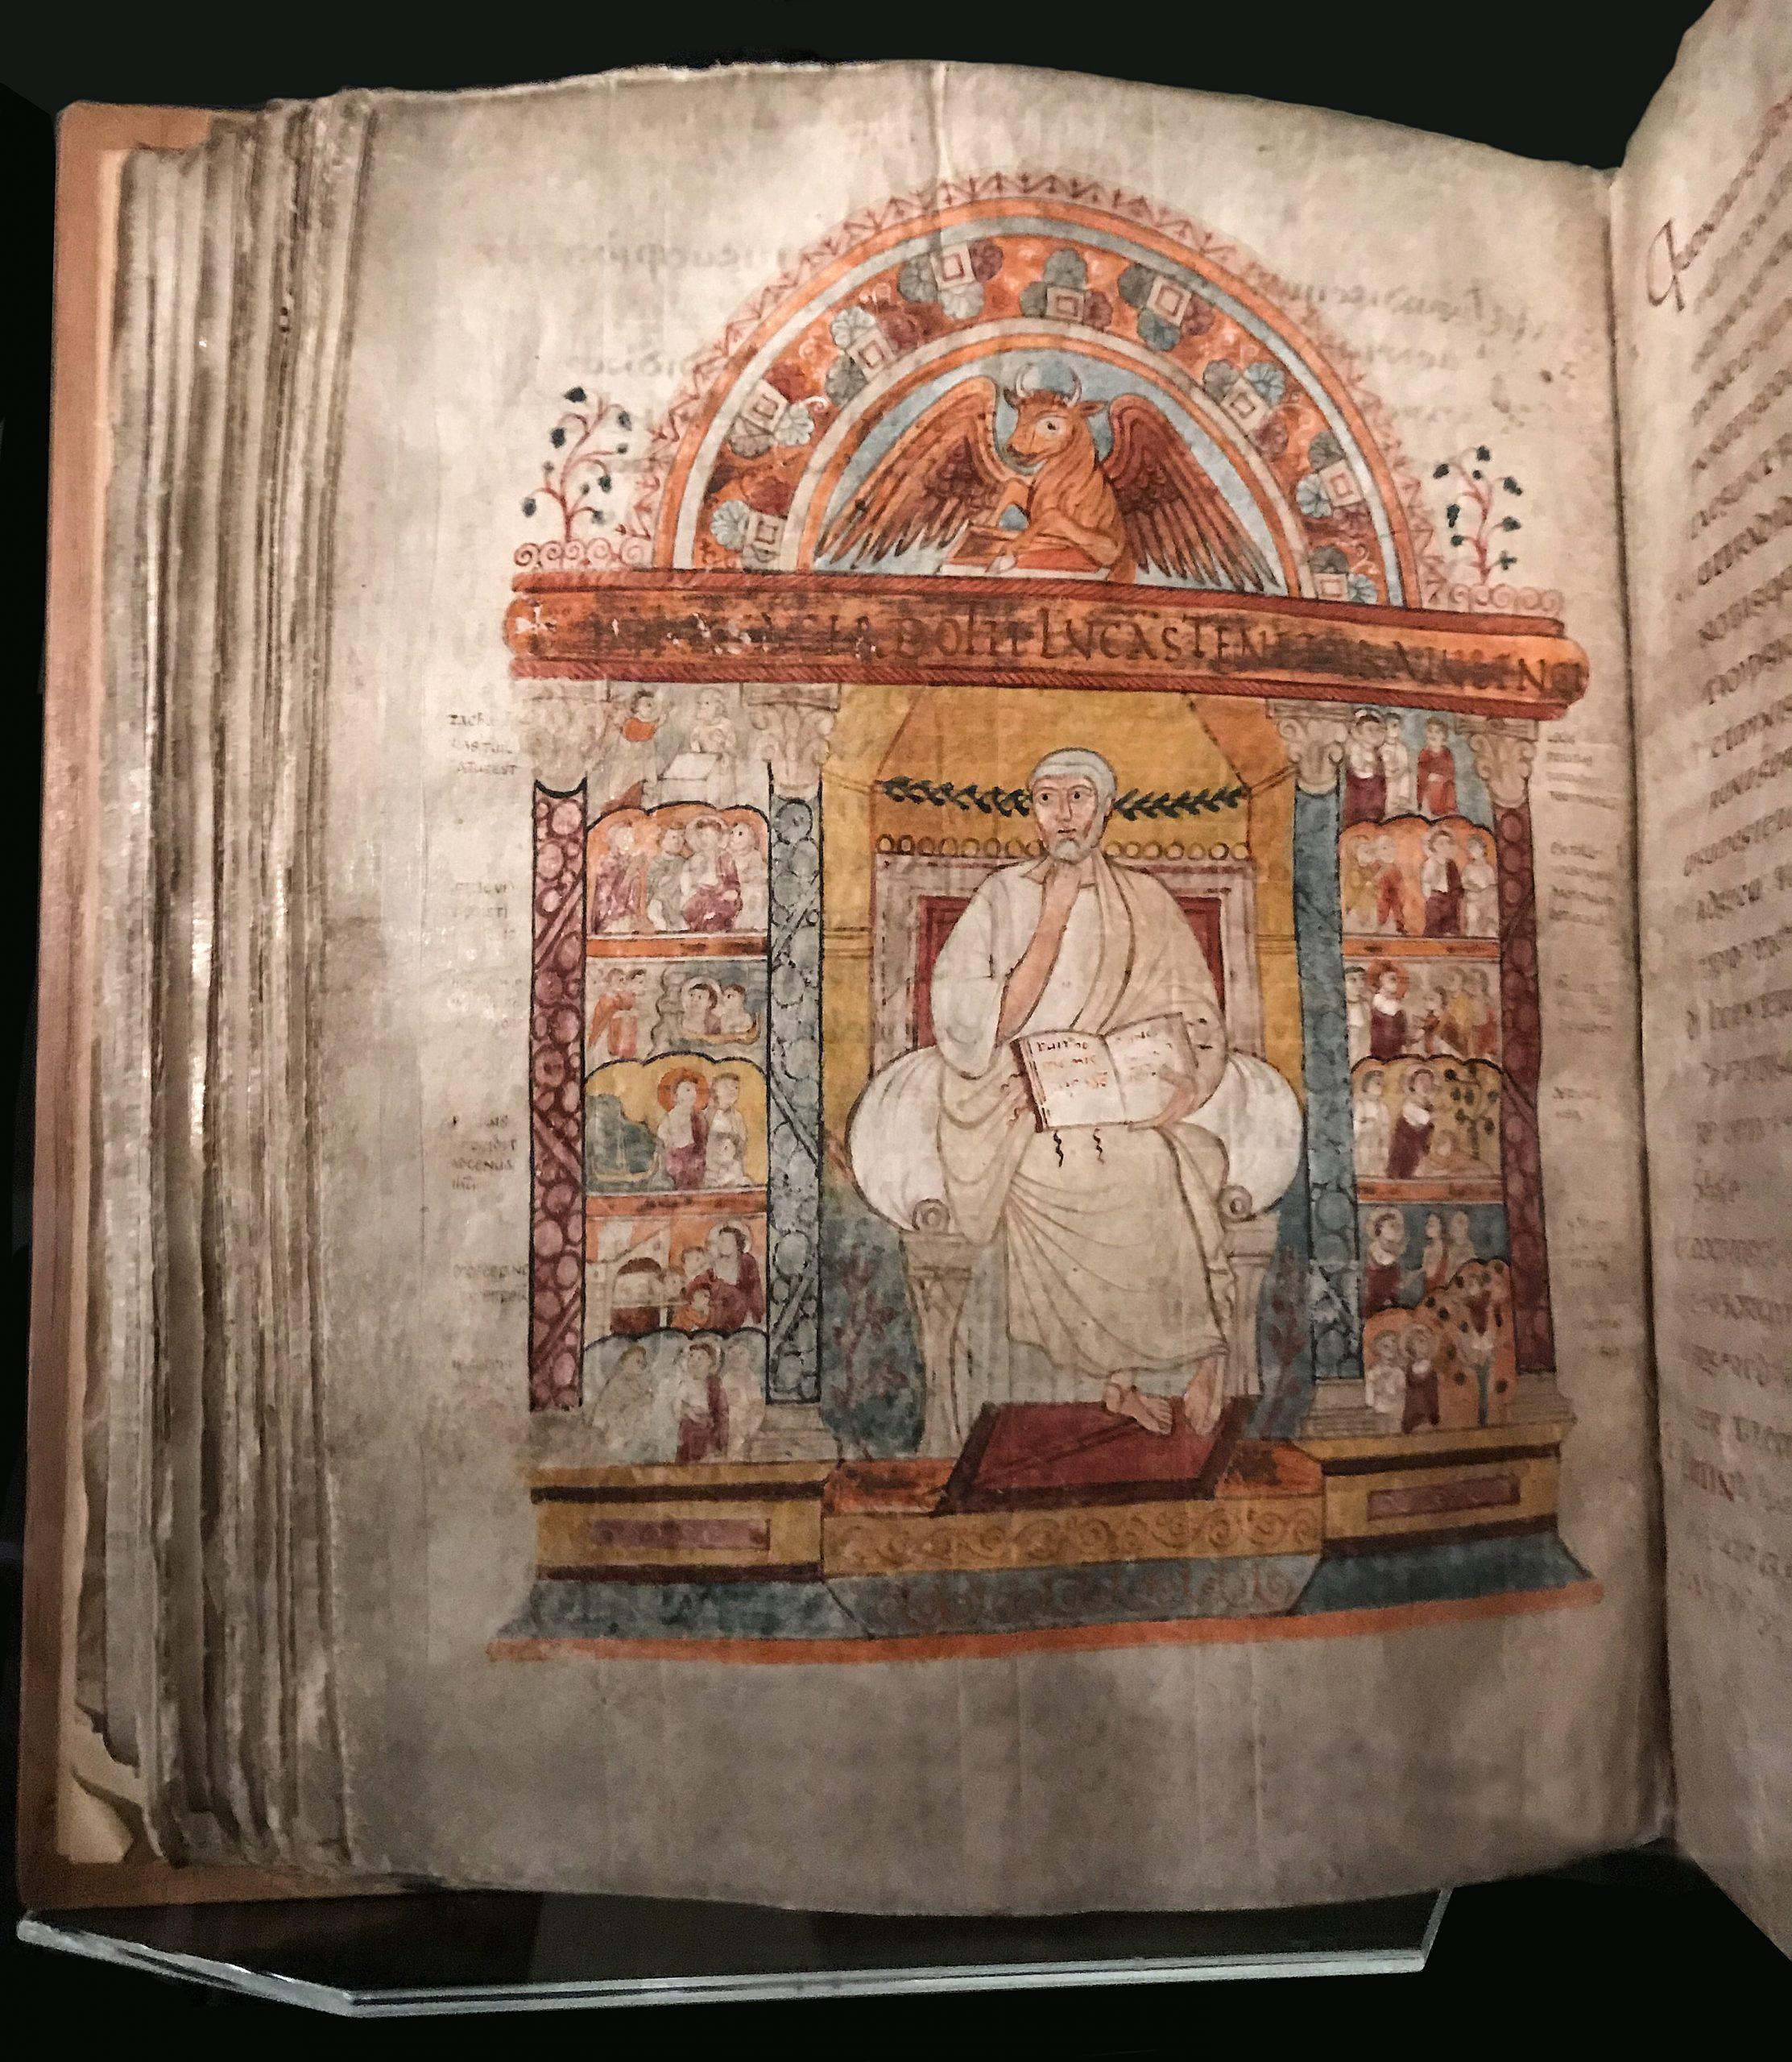 The St Augustine Gospels